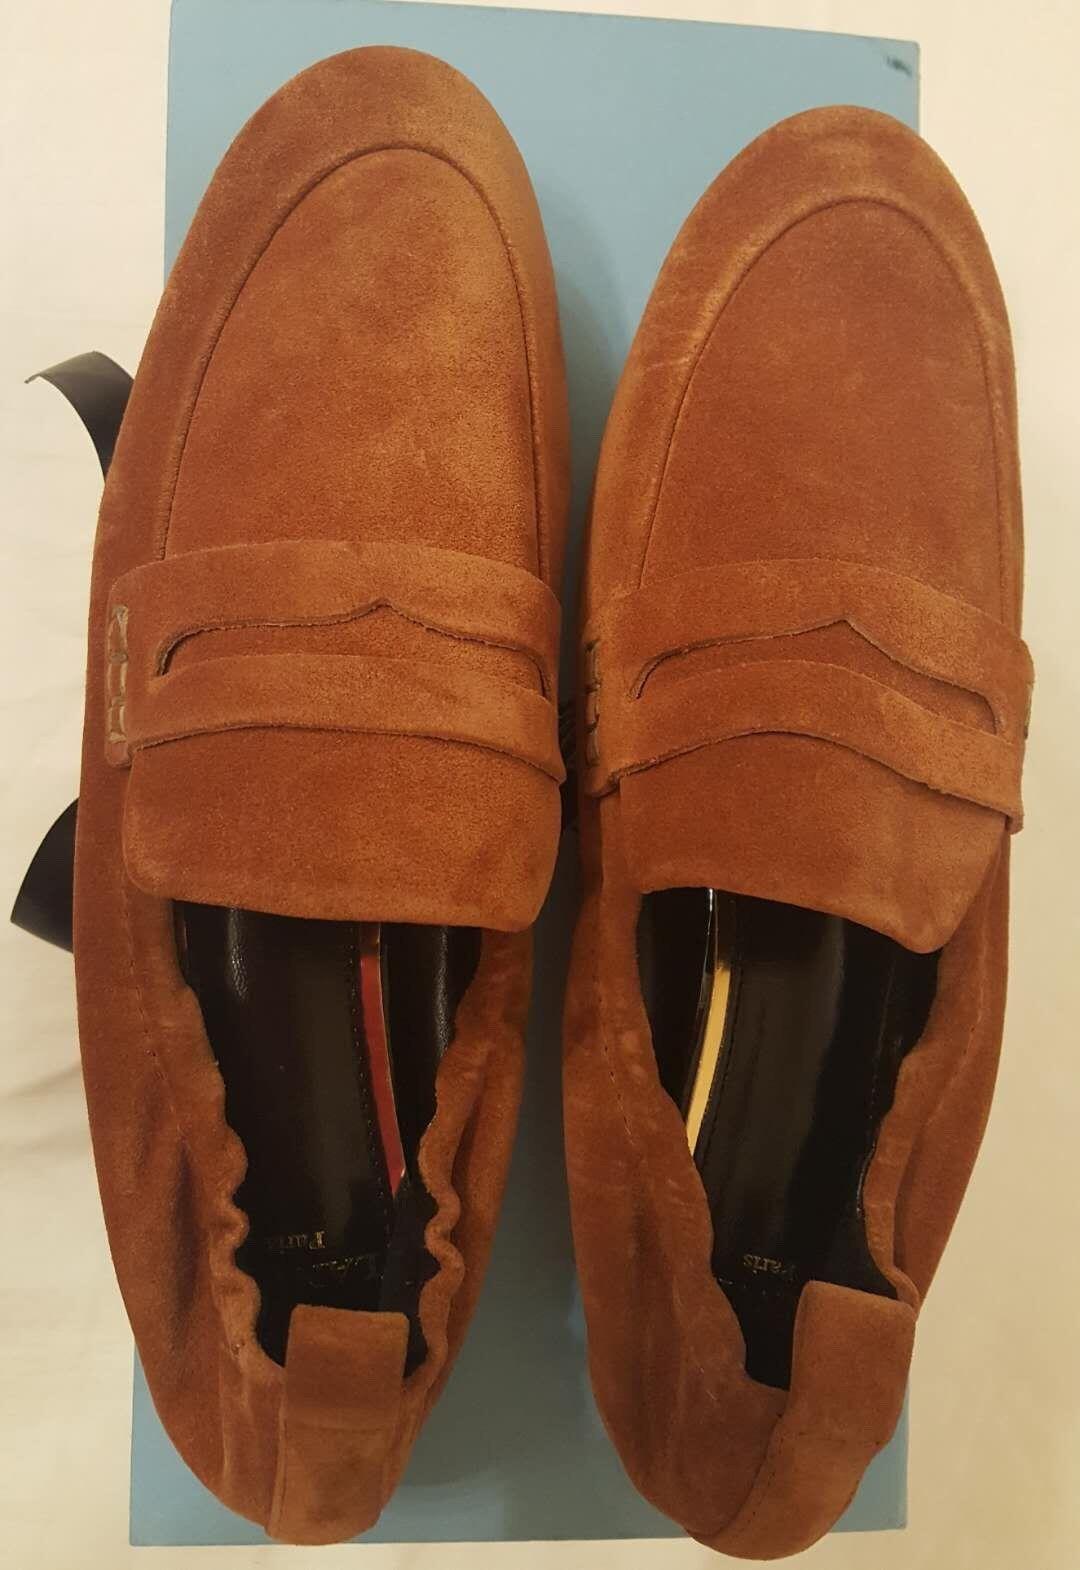 Brand New LANVIN classic soft Damens's penny loafers Größe Größe Größe 36.5 US Größe 6 6cff92